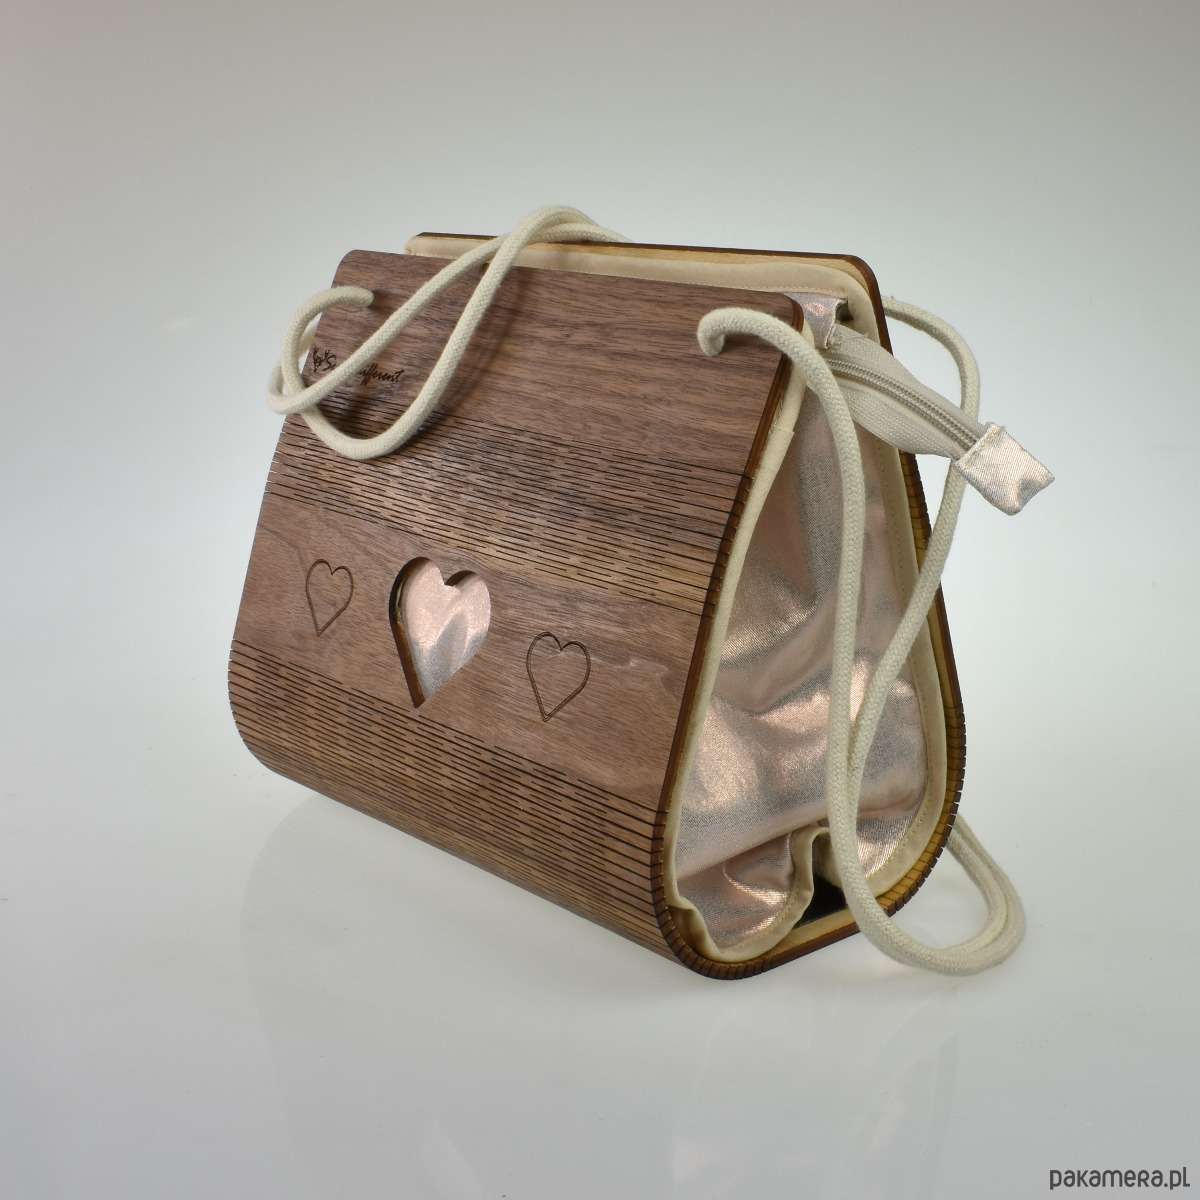 036411670a7e1 torby na ramię - damskie-Drewniana torebka na sznurku